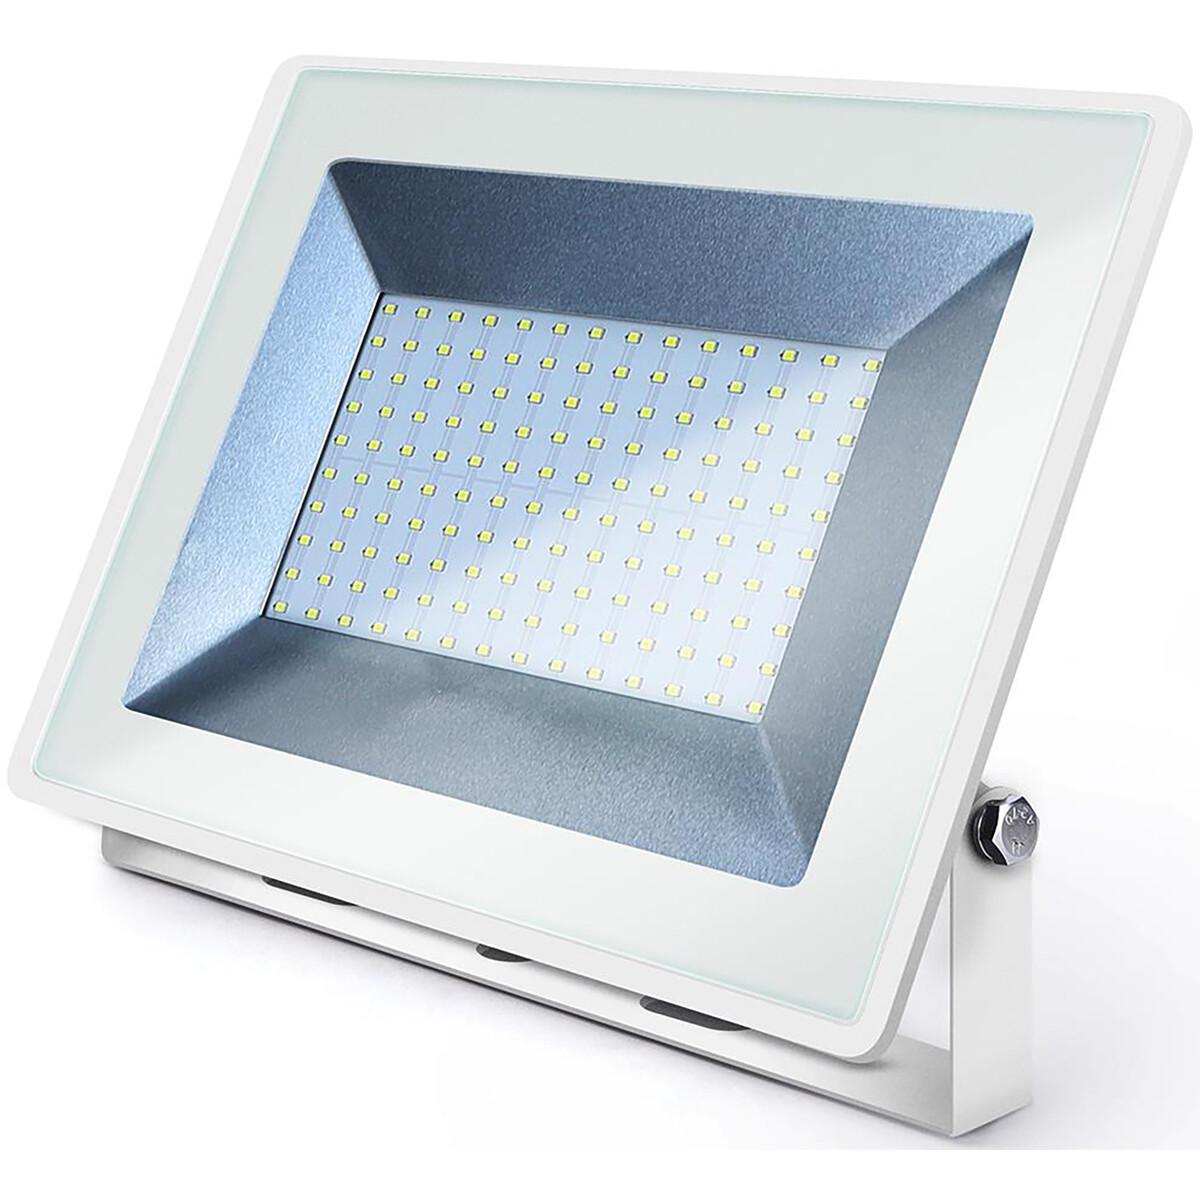 LED Bouwlamp 100 Watt - LED Schijnwerper - Aigi Iglo - Helder/Koud Wit 6400K - Waterdicht IP65 - Mat Wit - Aluminium